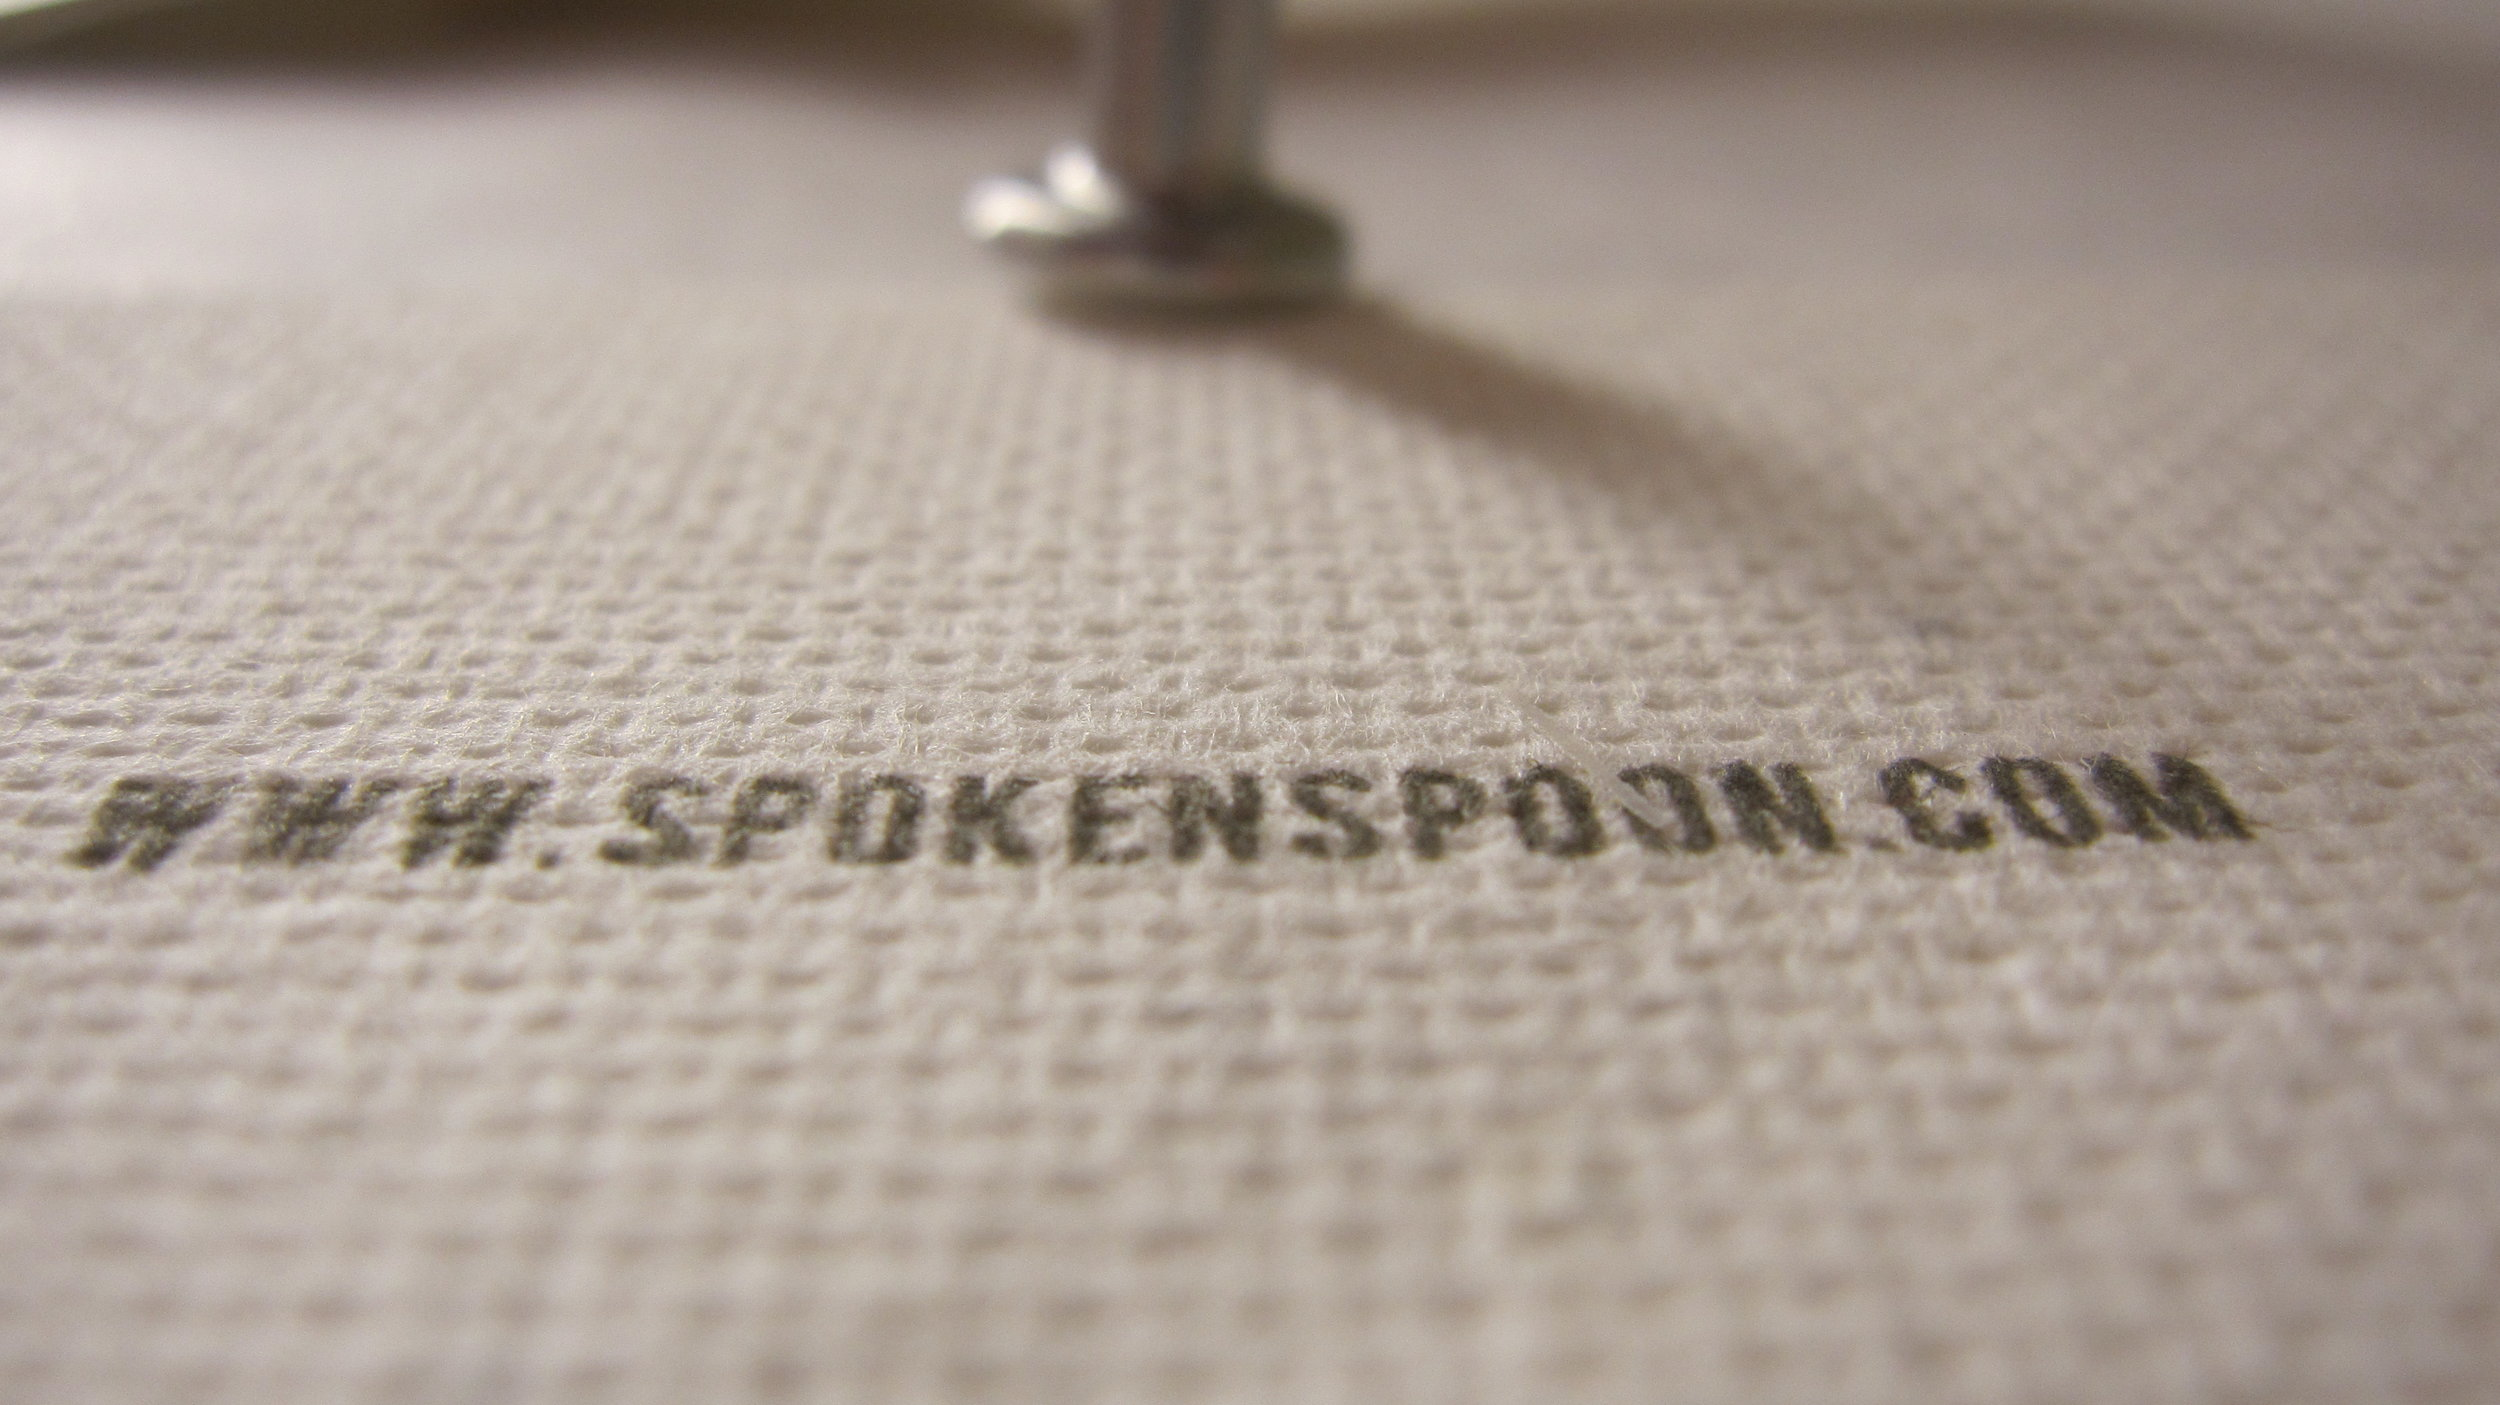 spokenspoon local food